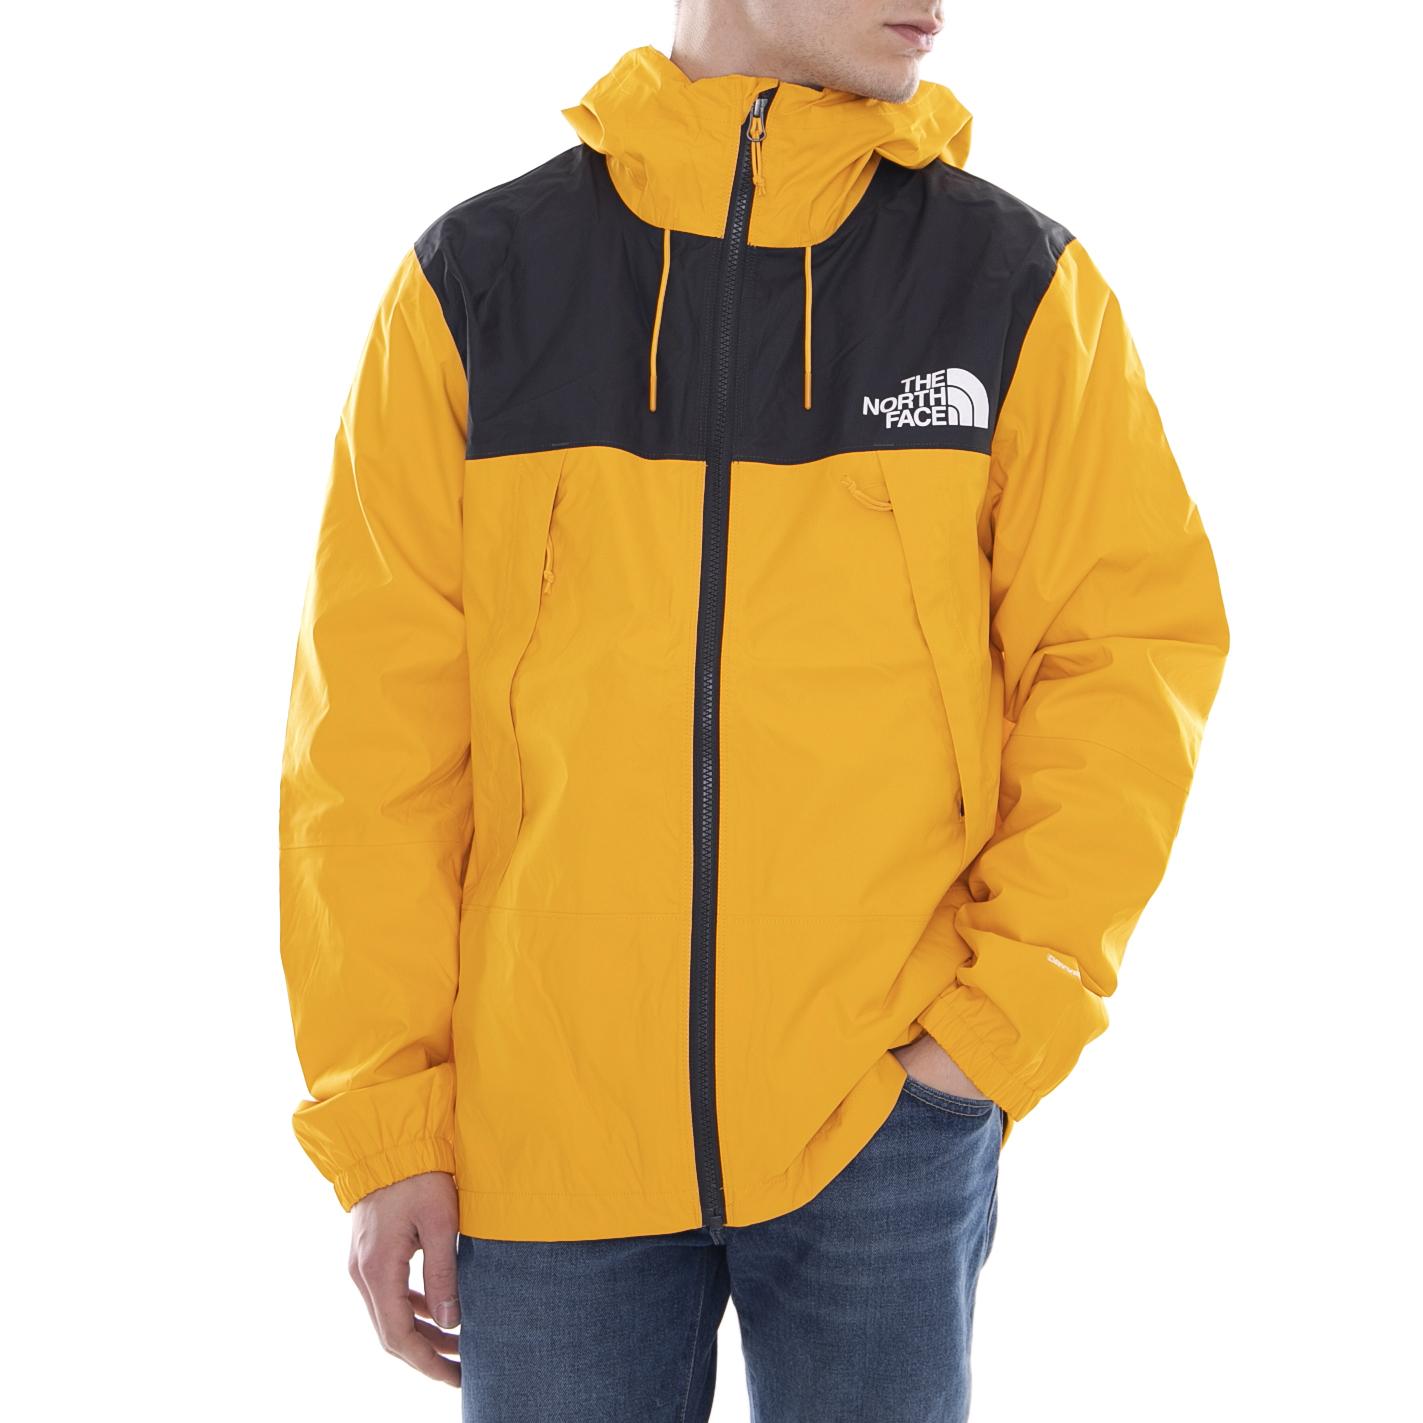 5d6099fae Details about The north face jacket m 1990 mountain q jacket zinnia orange  orange